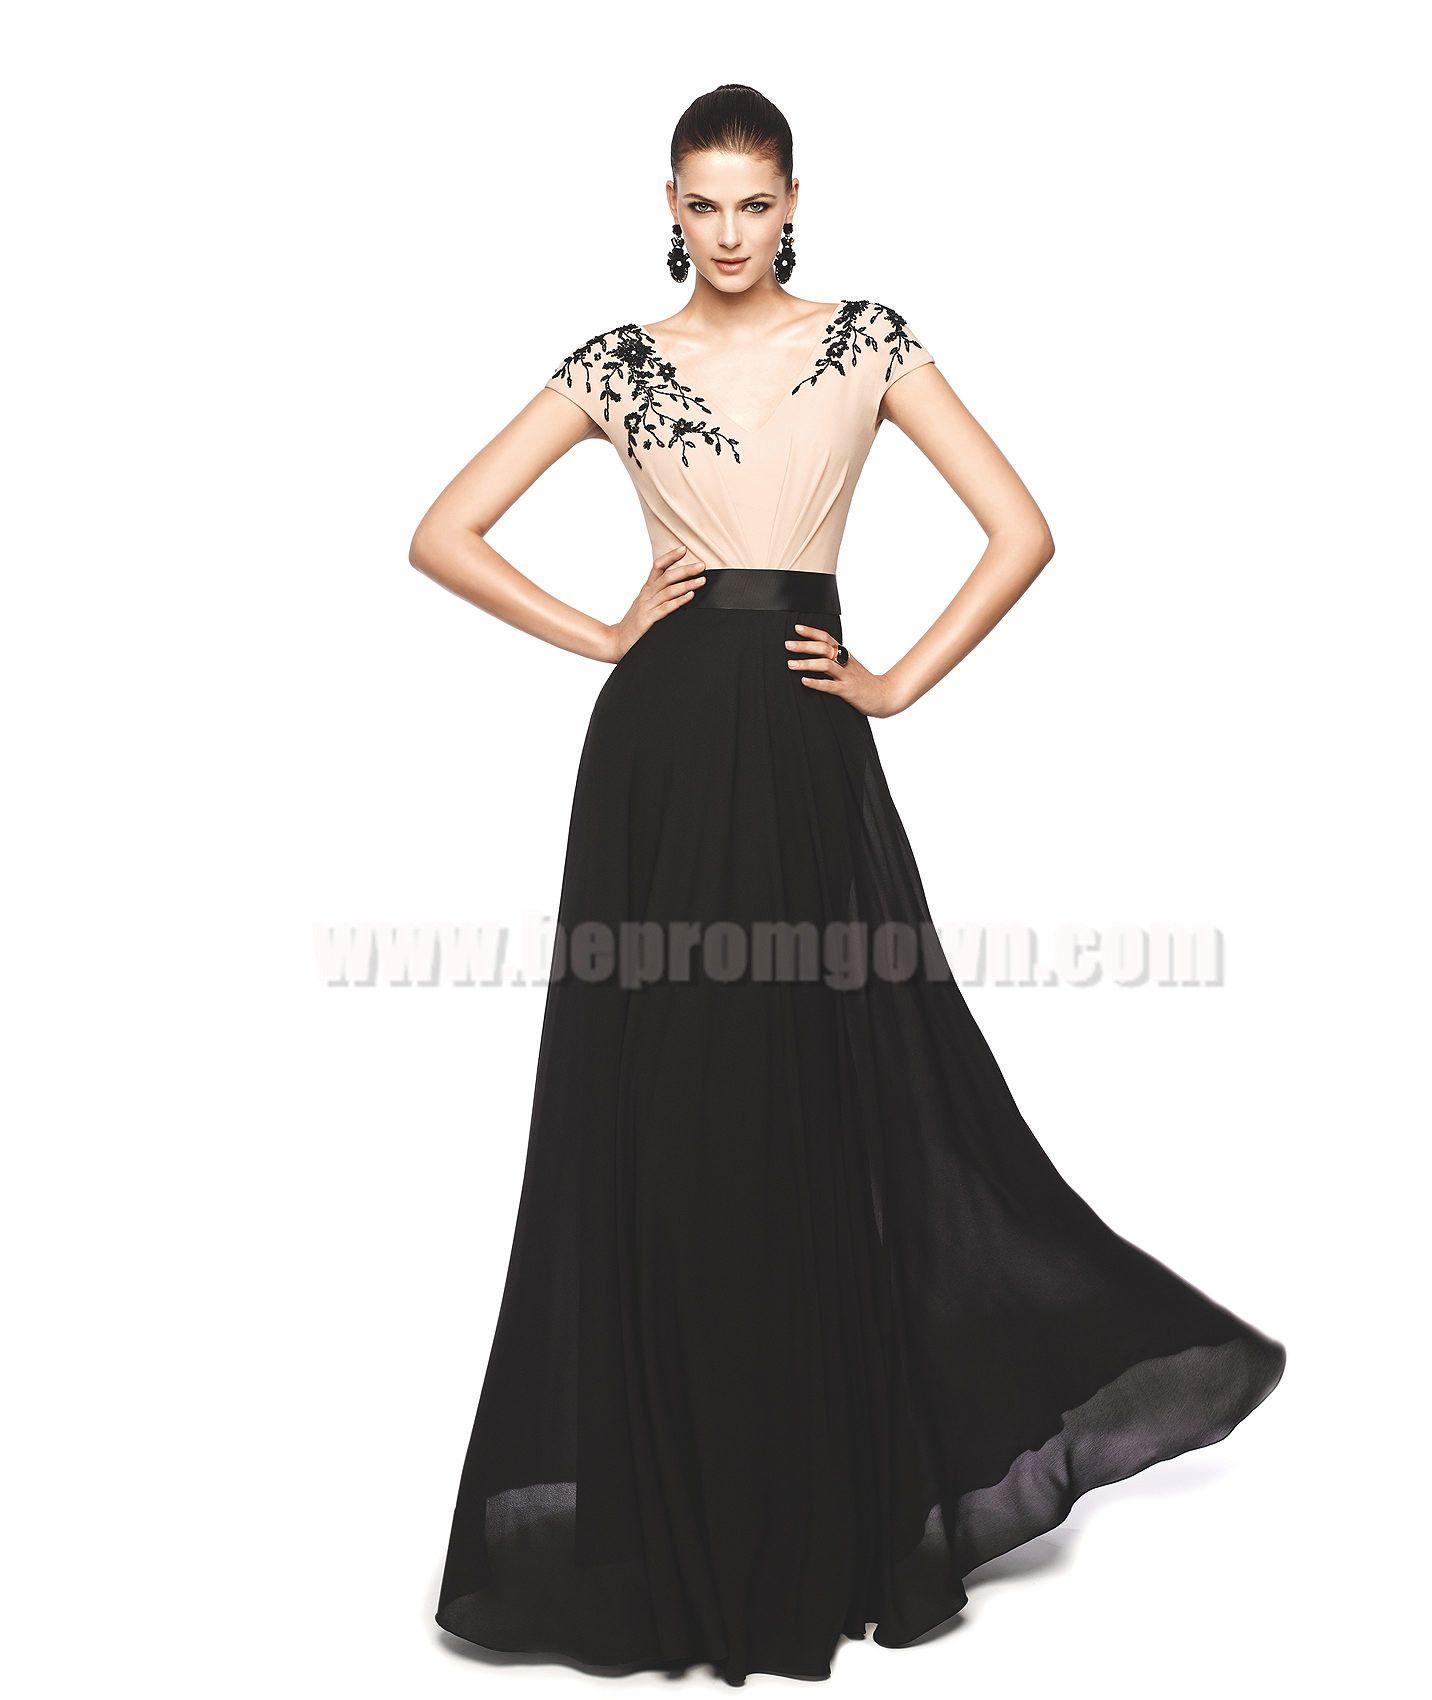 Princess Cocktail Dresses 2015 Pronovias Style NAGRID [Pronovias ...